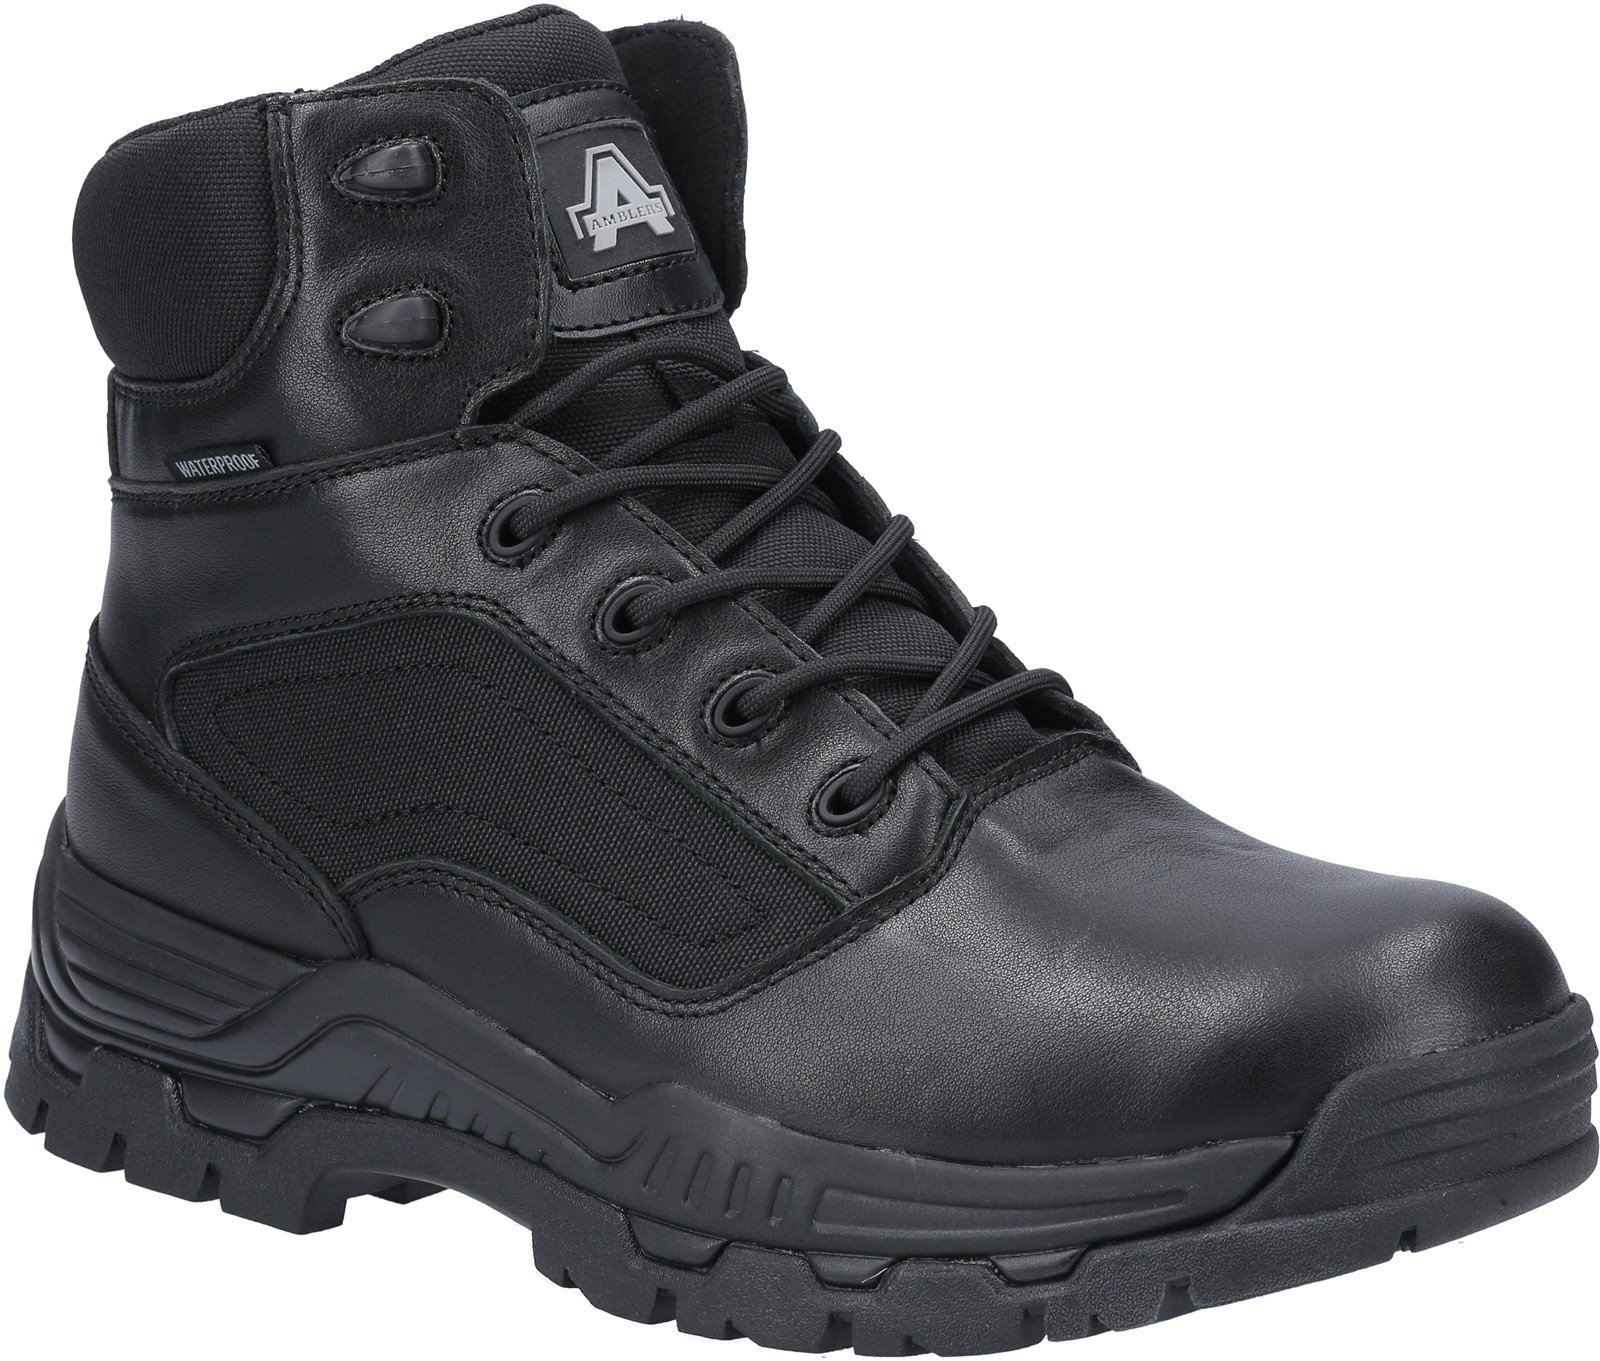 Amblers Unisex Mission Waterproof Occupational Boot Black 31343 - Black 6